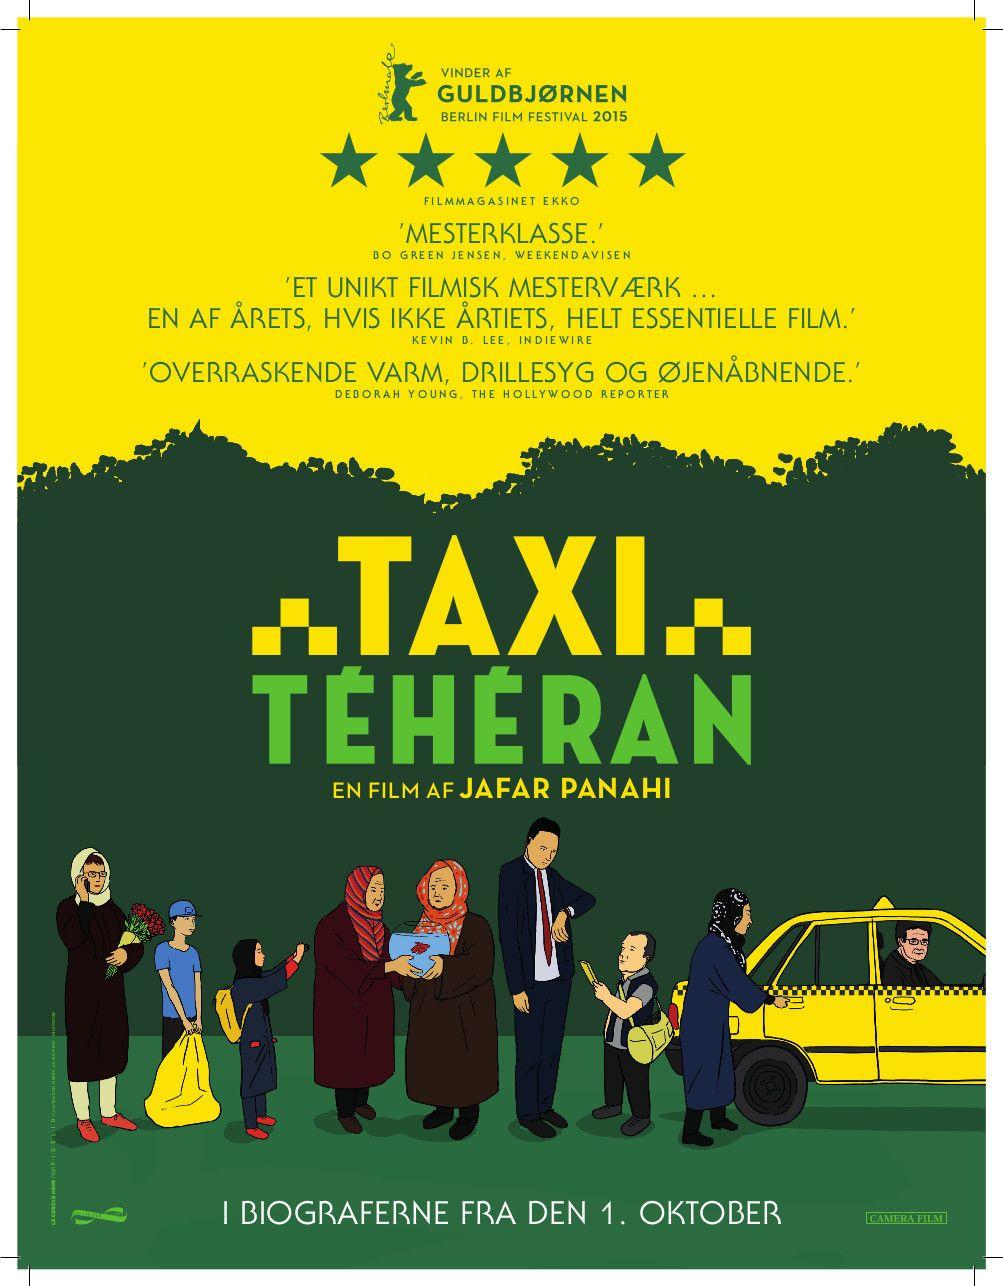 1/10/15 #TaxiTeheran #nicolaibio #kolding #torsdagsevent